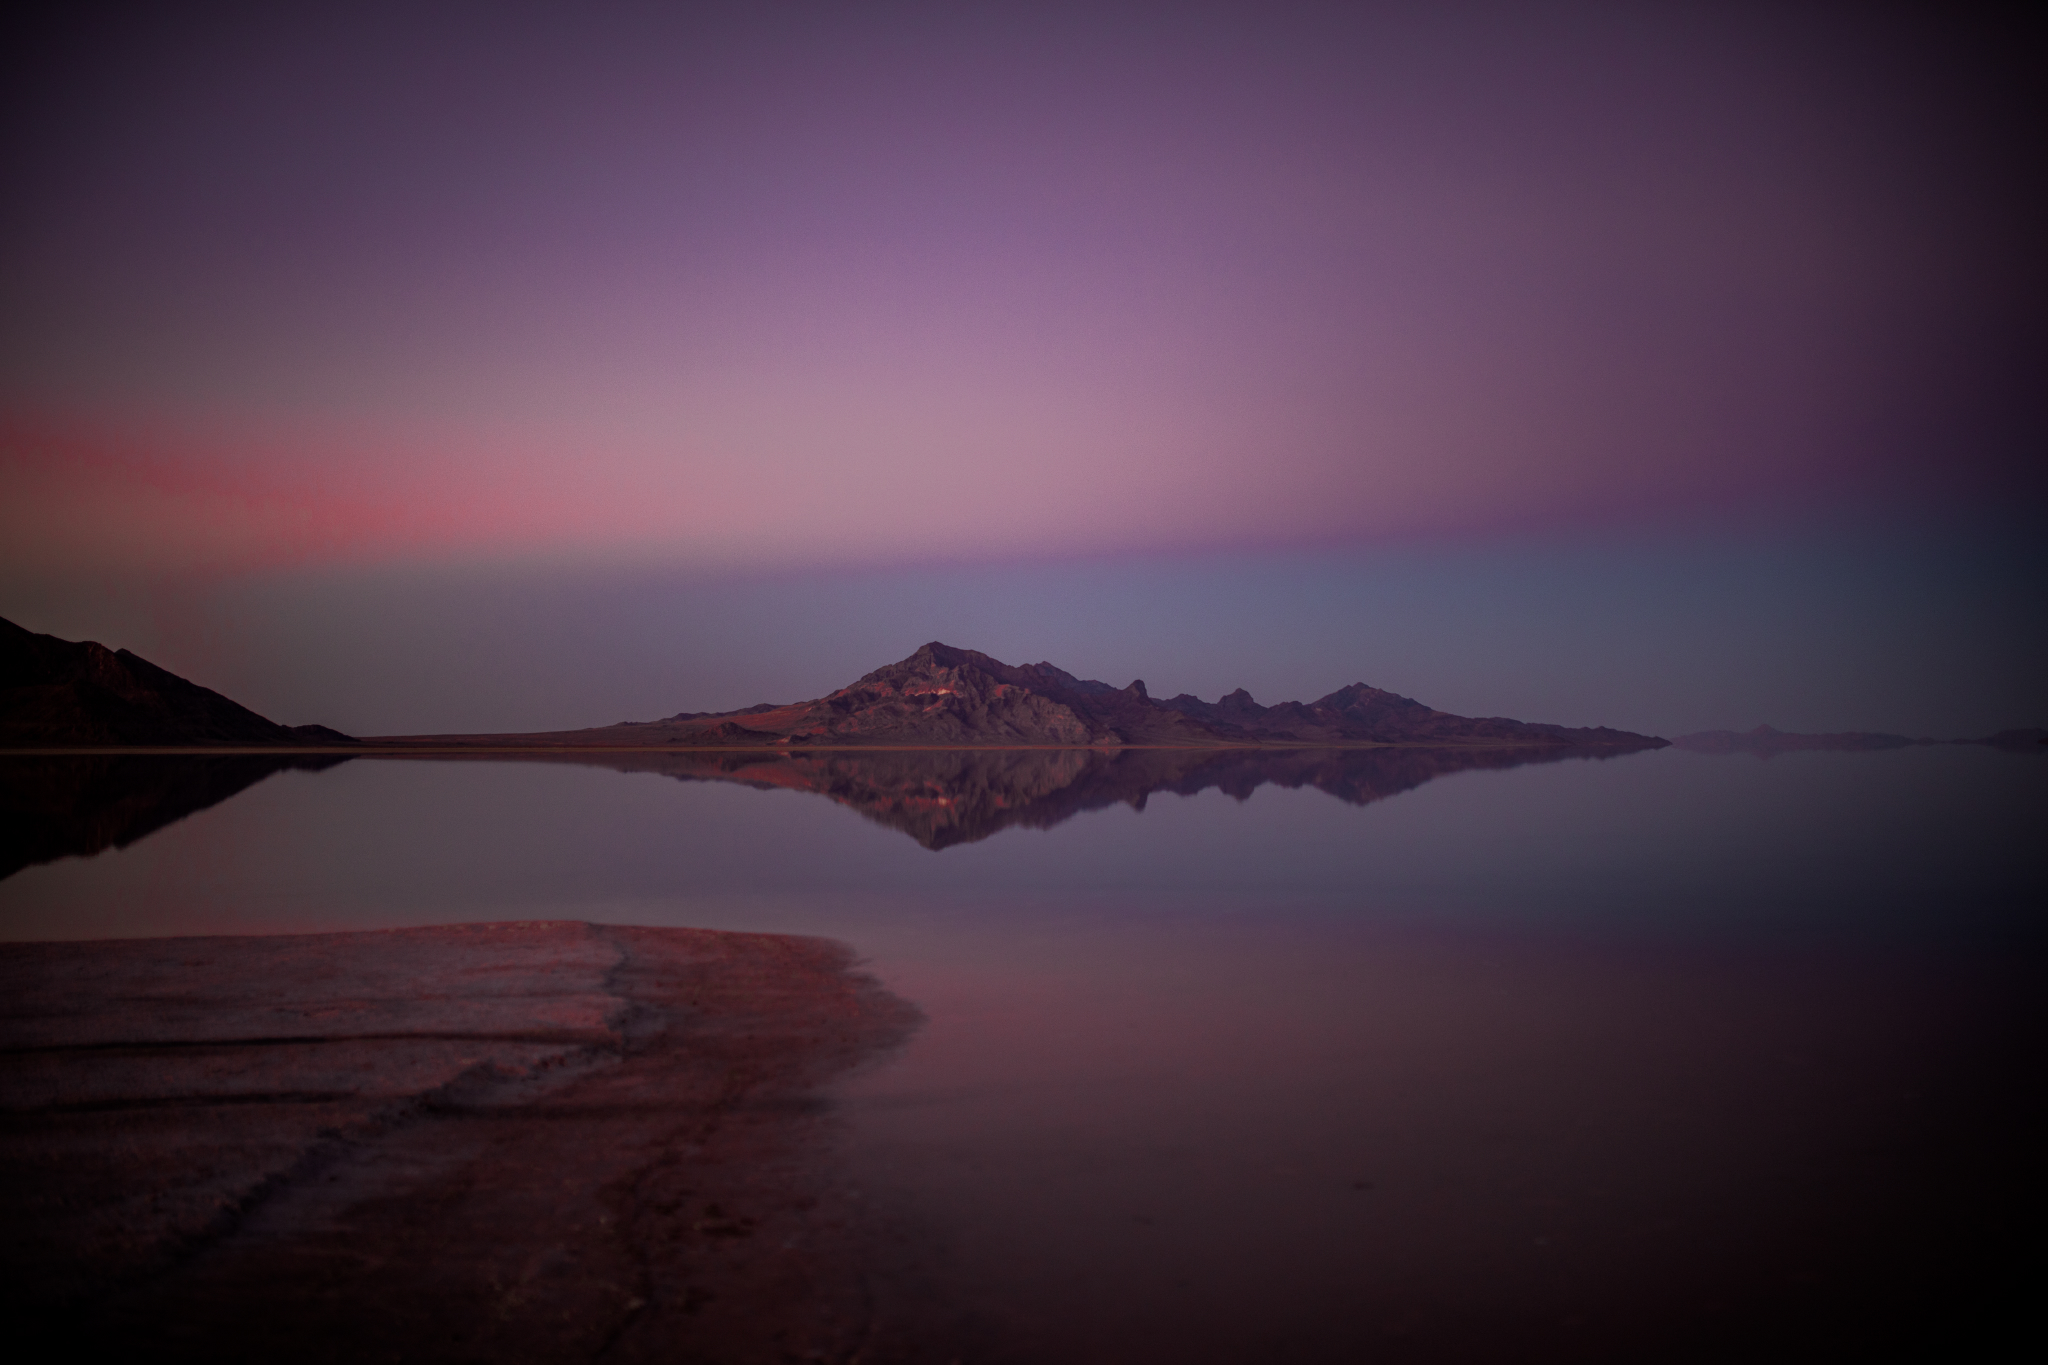 san diego wedding   photographer | bonneville salt flats and purple-blue sky with one mountain   range